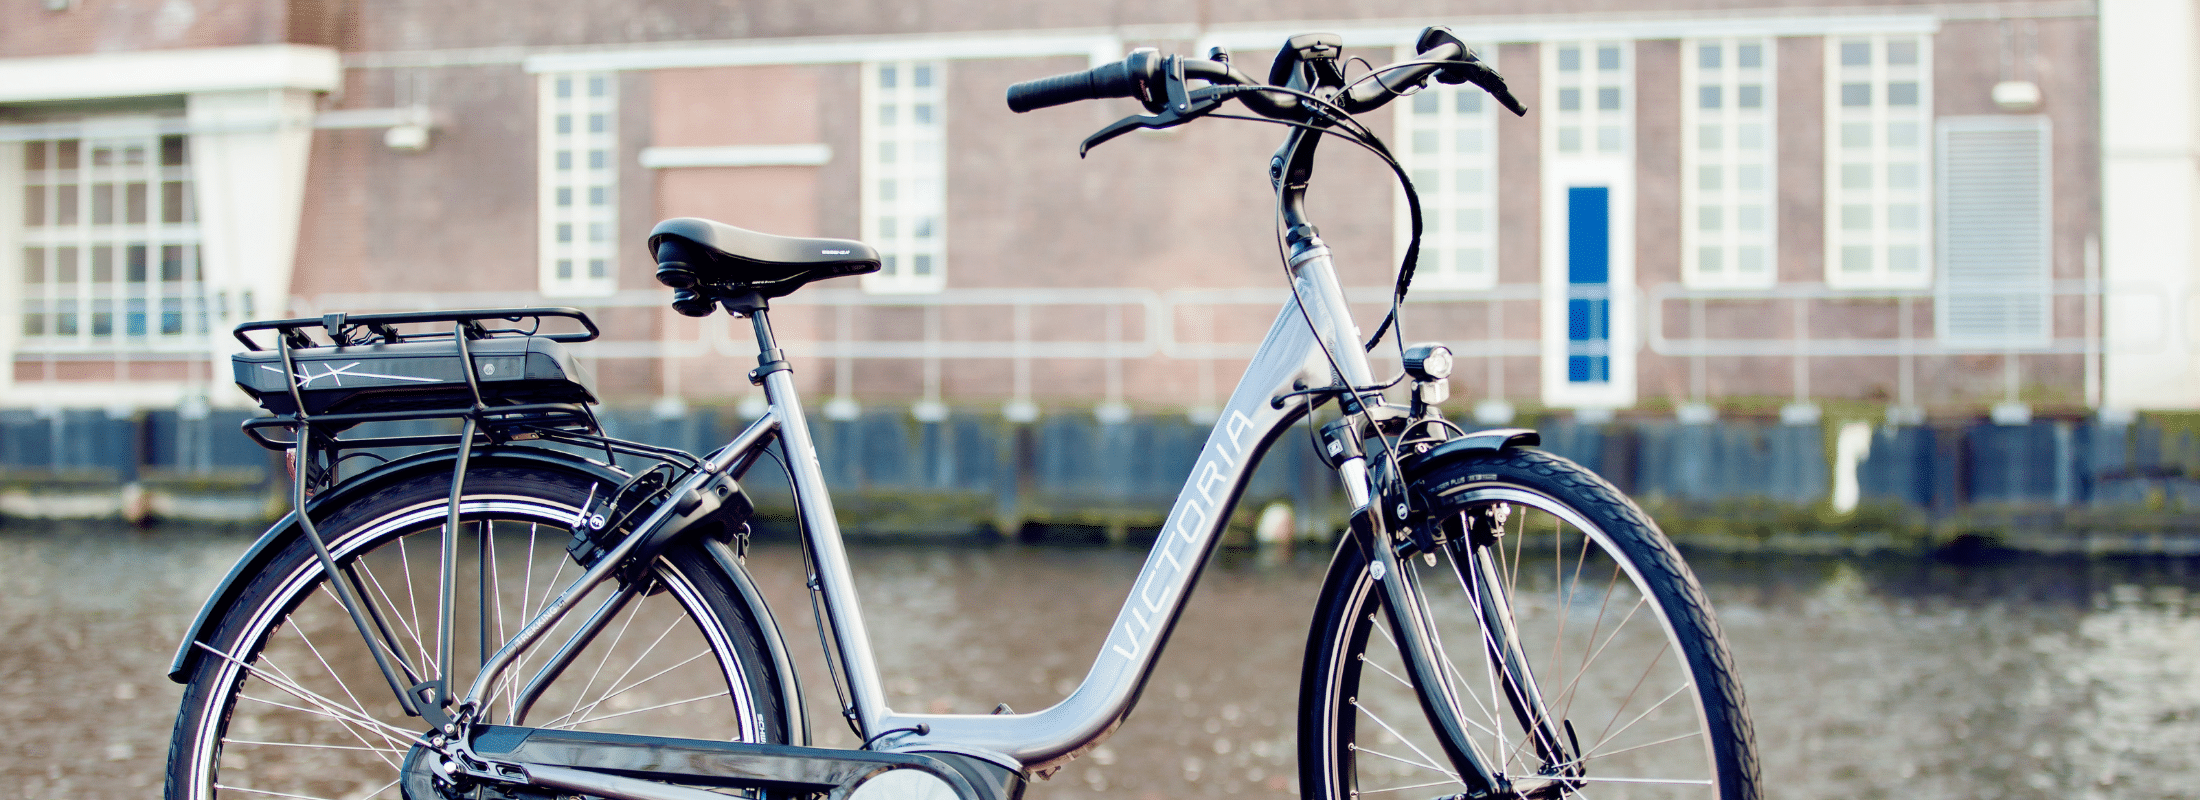 E-Bike keuze hulp